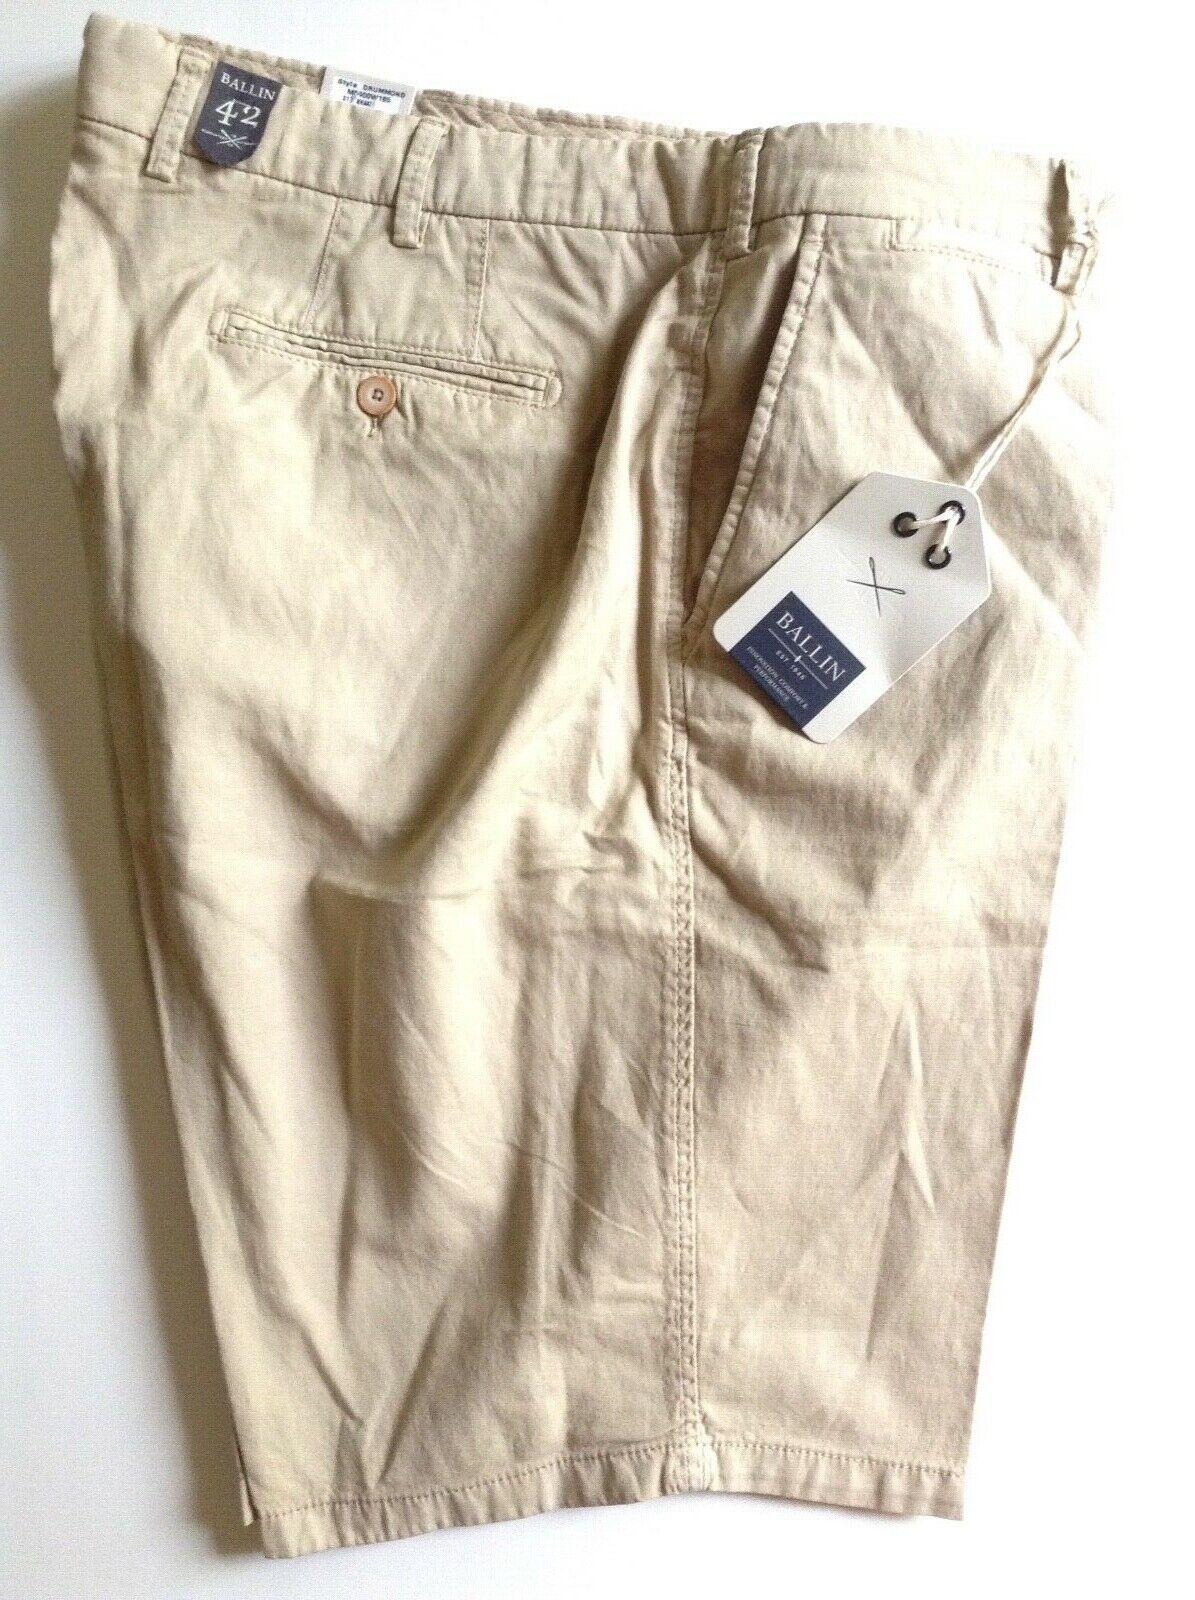 Ballin Mens NWT light khaki cotton linen blend flat front shorts size 42